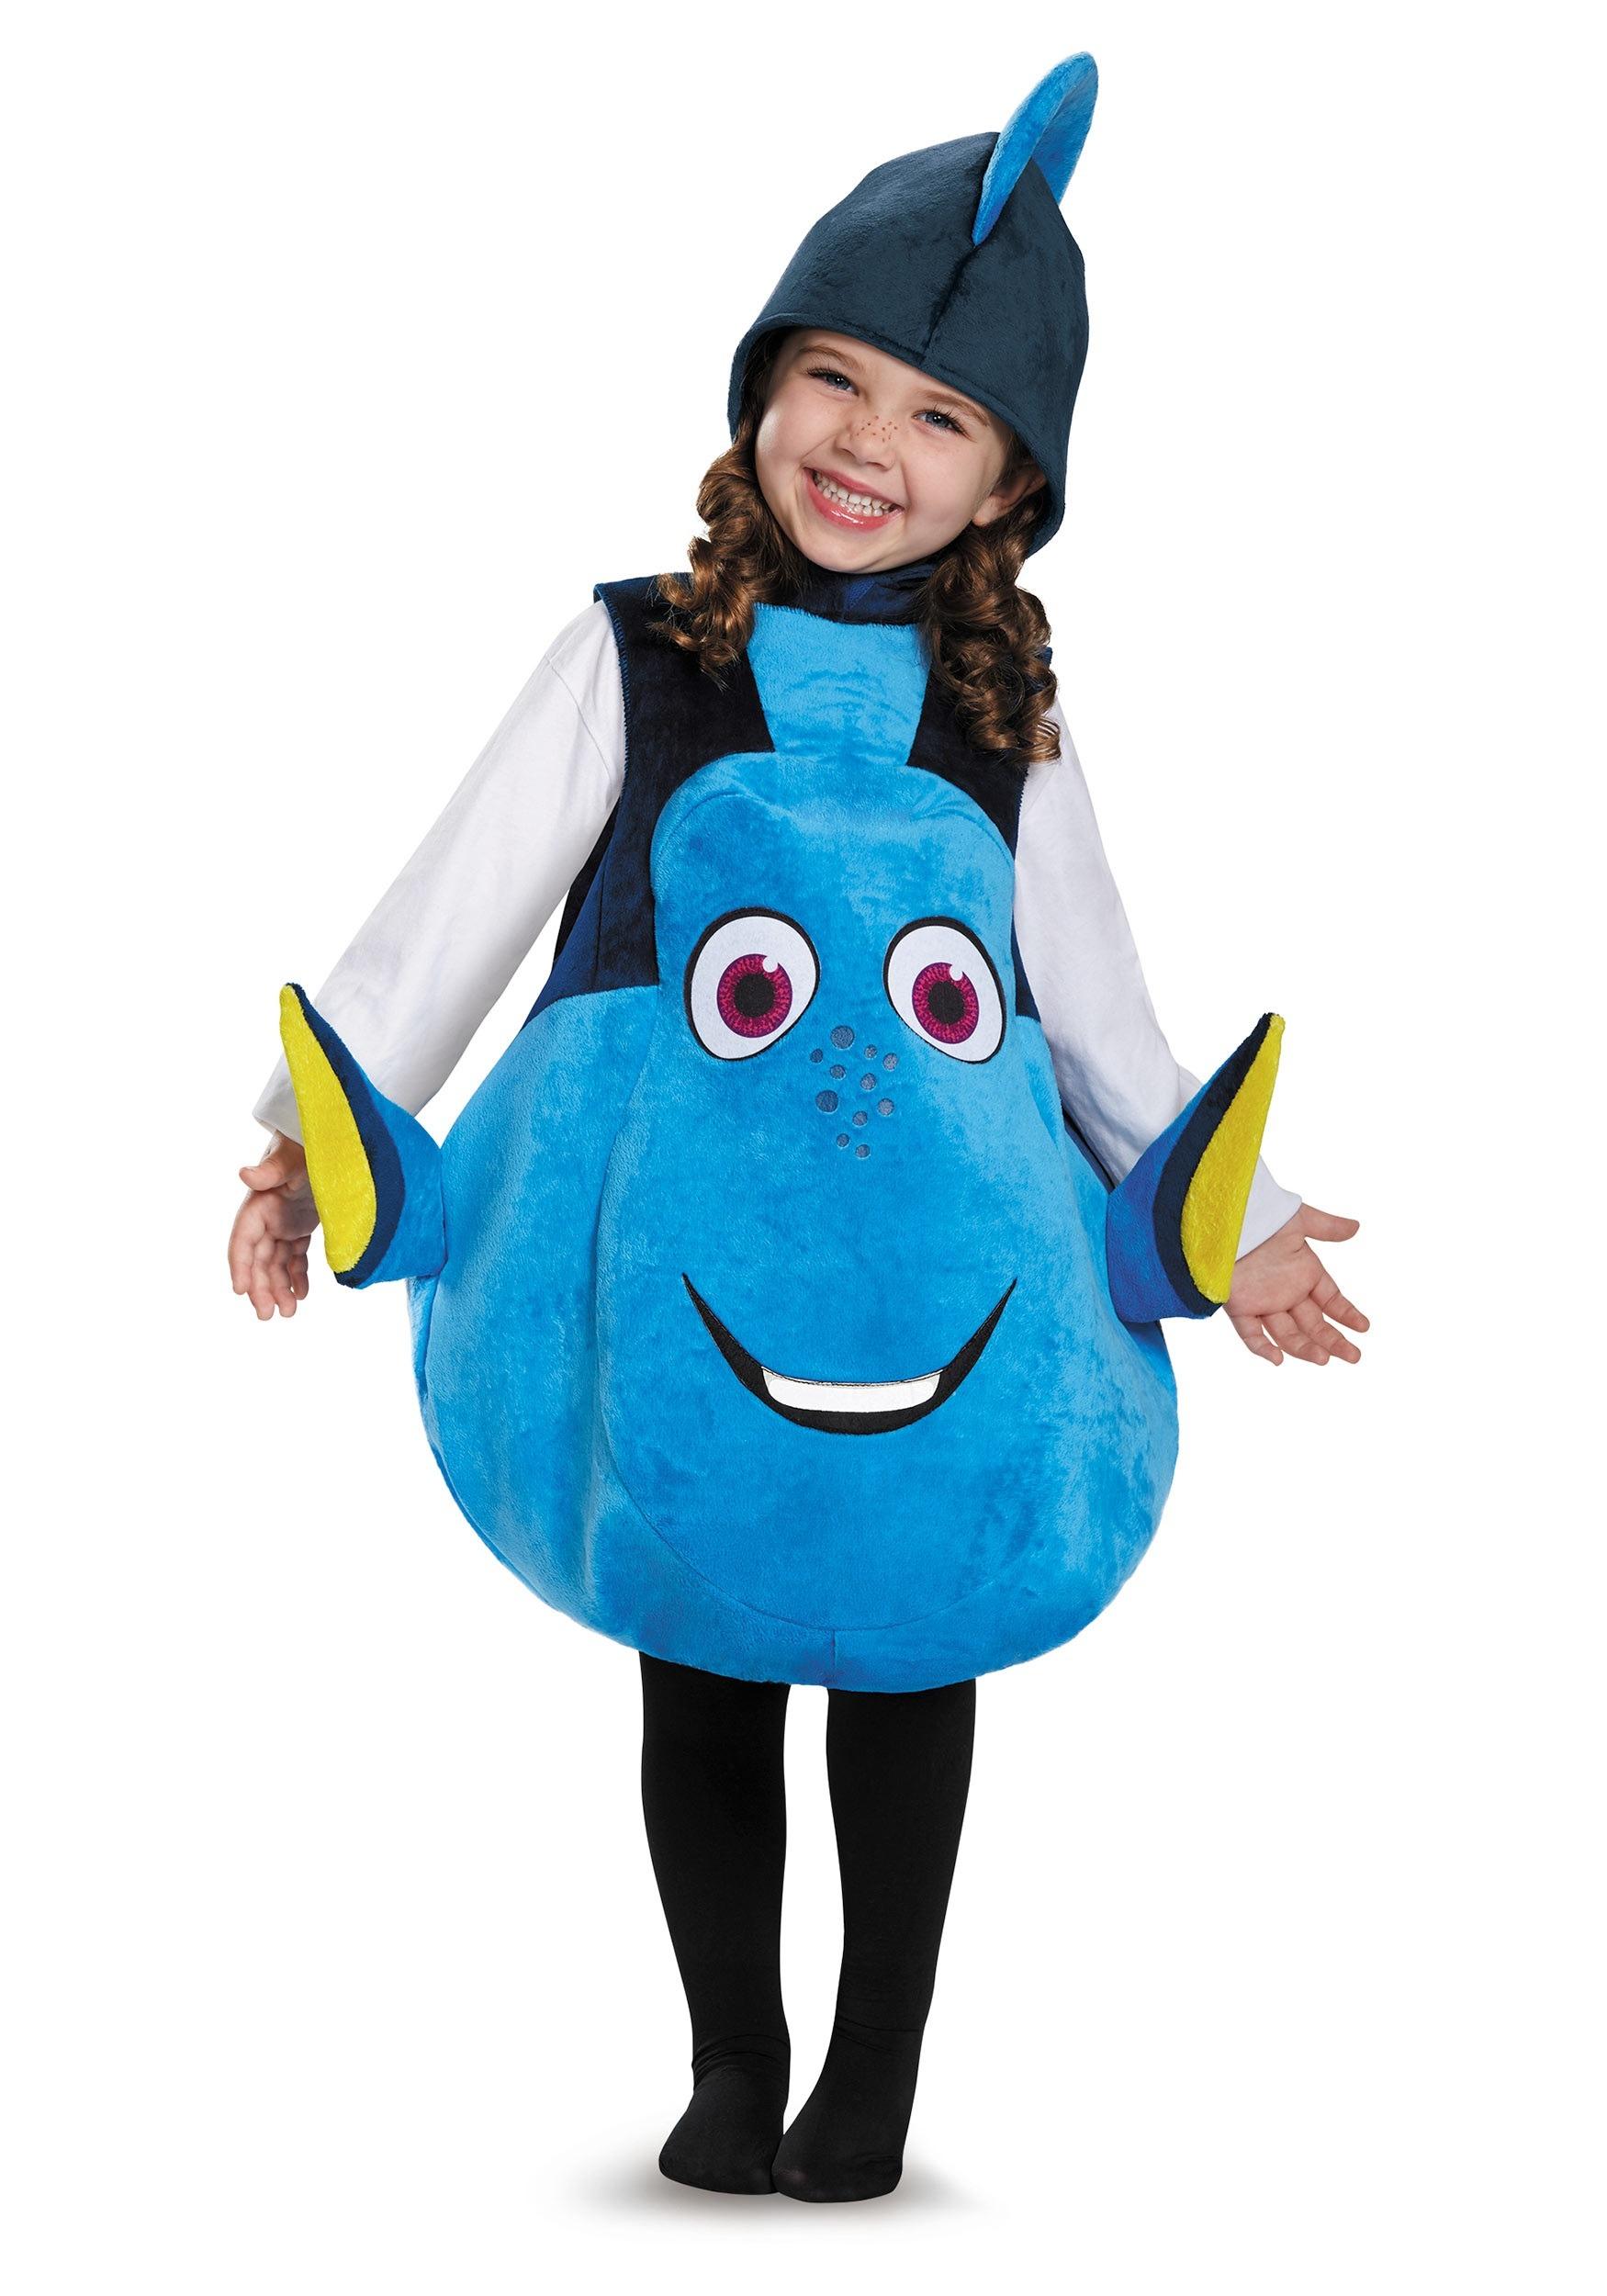 Disney Finding Nemo Costumes - HalloweenCostumes.com